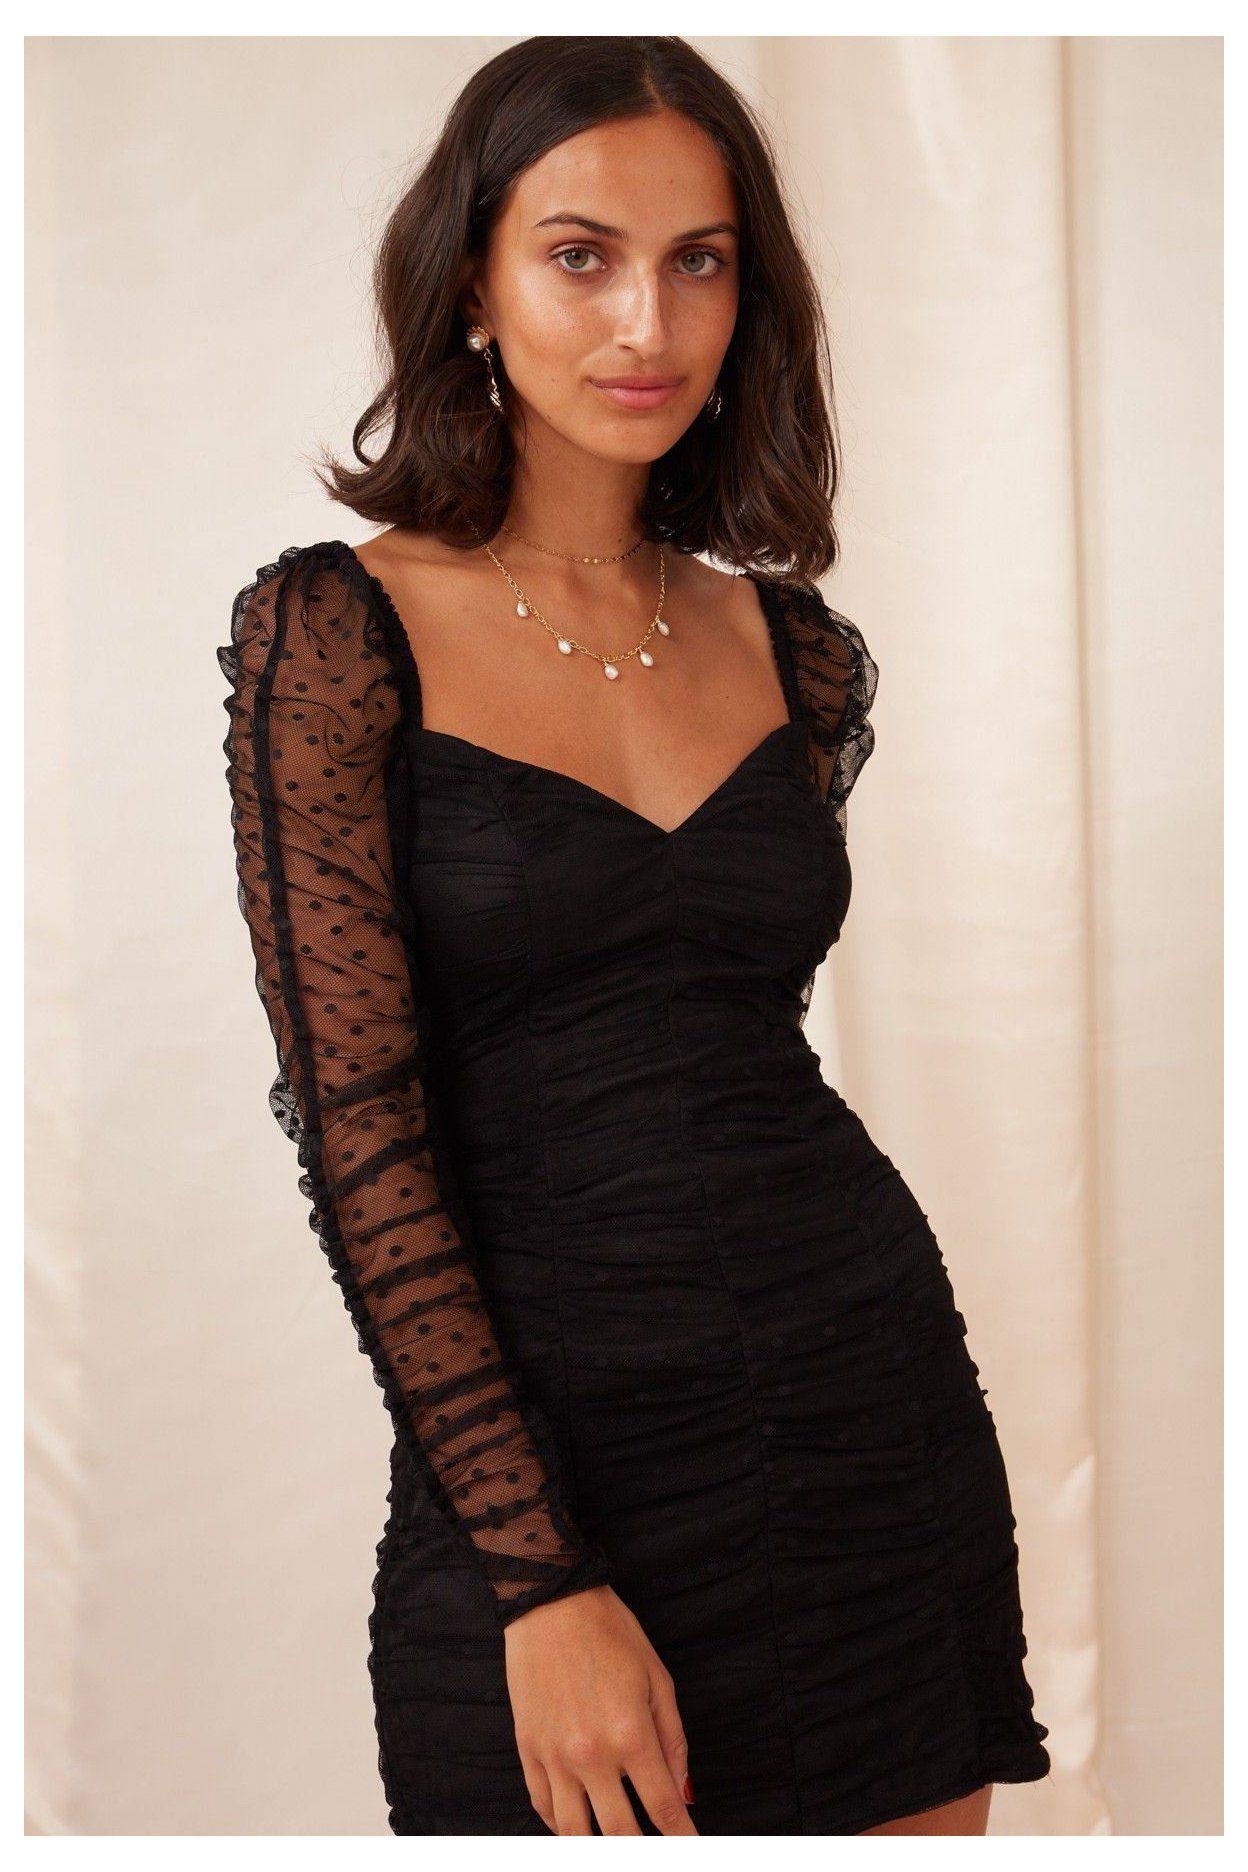 Long Sleeve Dresses Bnkr Shop Online Now Tight Formal Dresses Short Long Sleeve Tightfo In 2021 Black Long Sleeve Dress Black Short Dress Sheer Sleeve Dress [ 1872 x 1248 Pixel ]